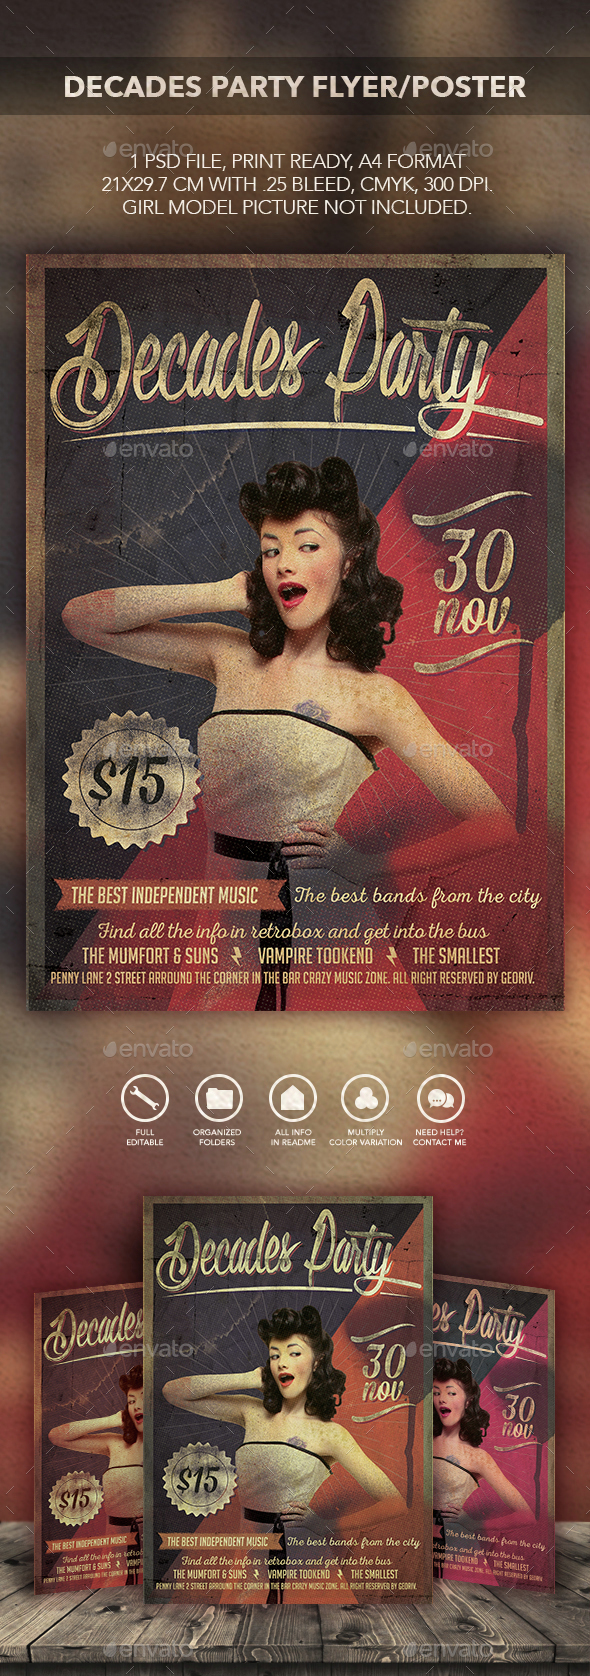 Decades Party Flyer/Poster - Flyers Print Templates